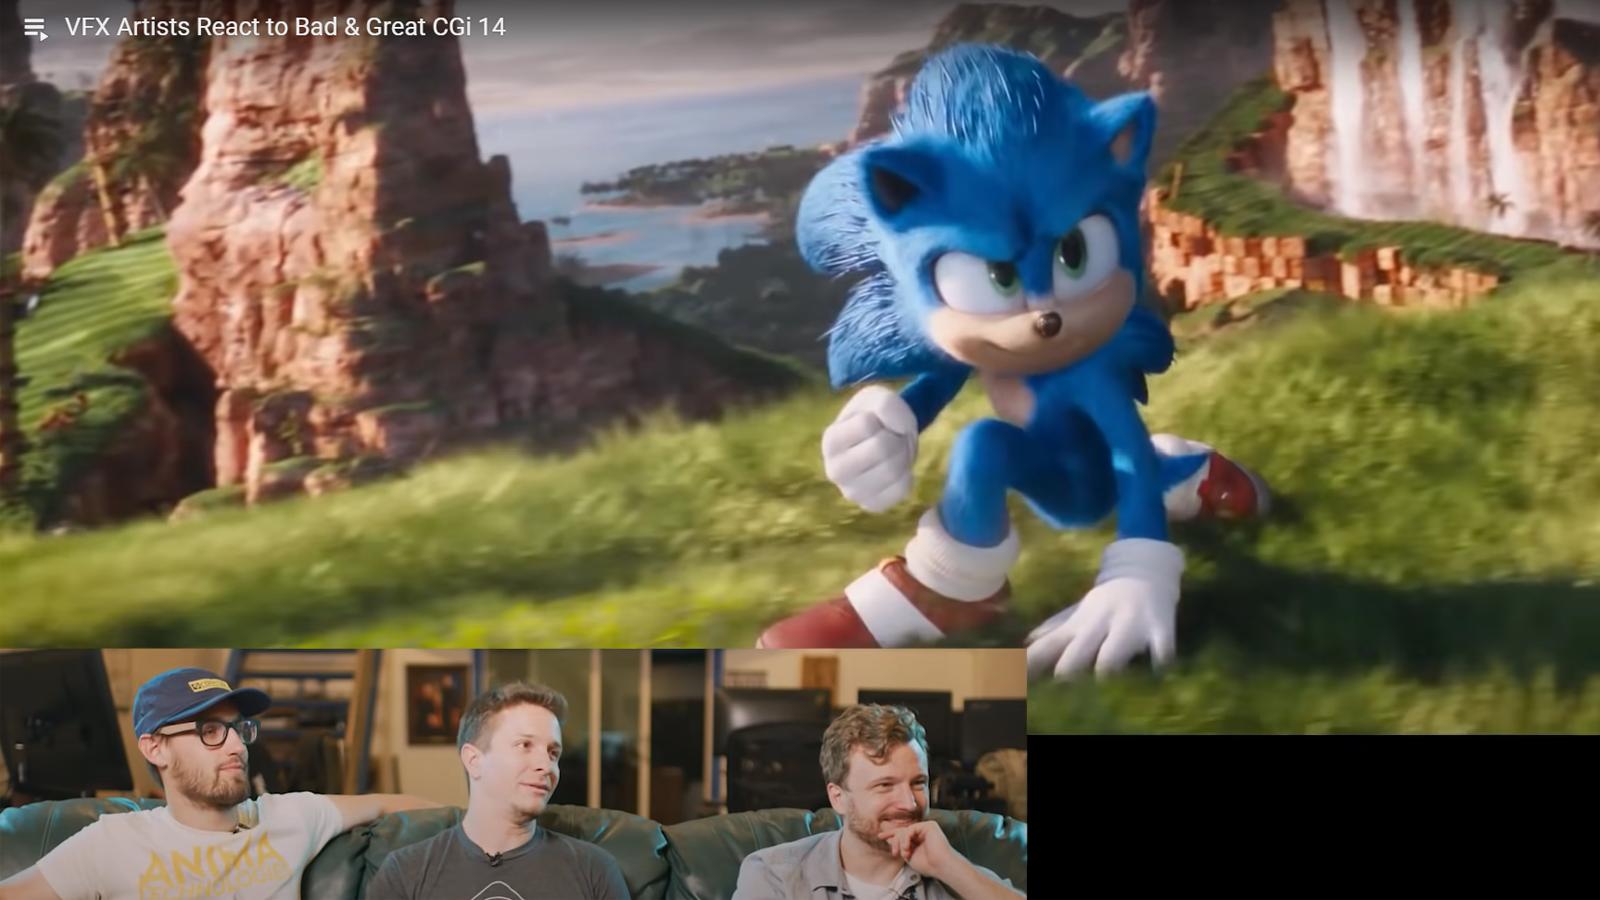 The Corridor Crew reacting to CGI scenes in movies